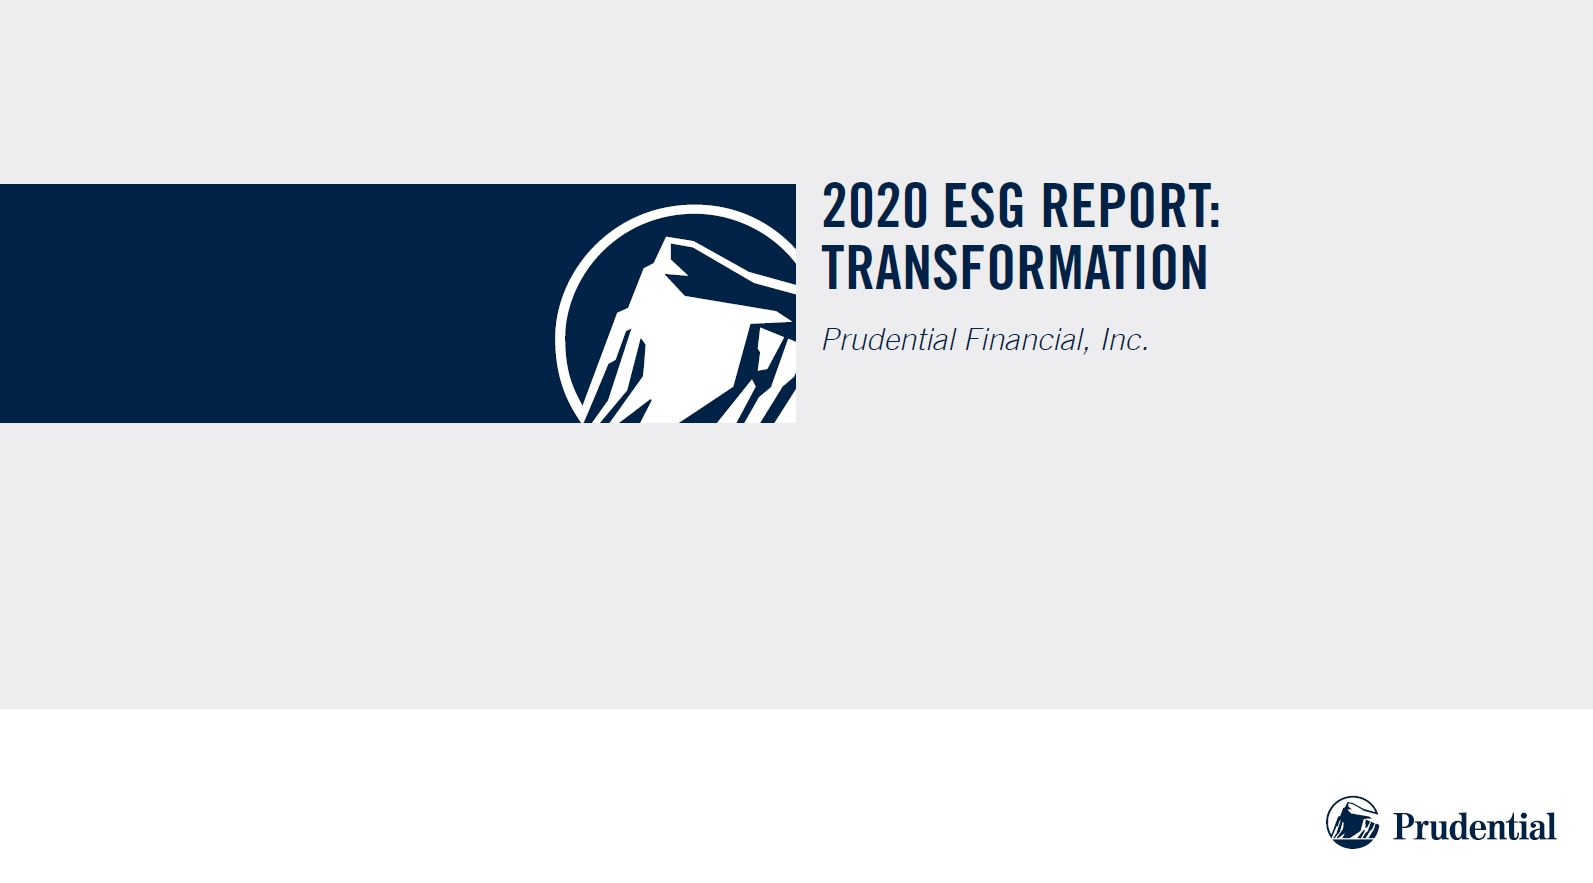 Prudential 2020 ESG Report Cover